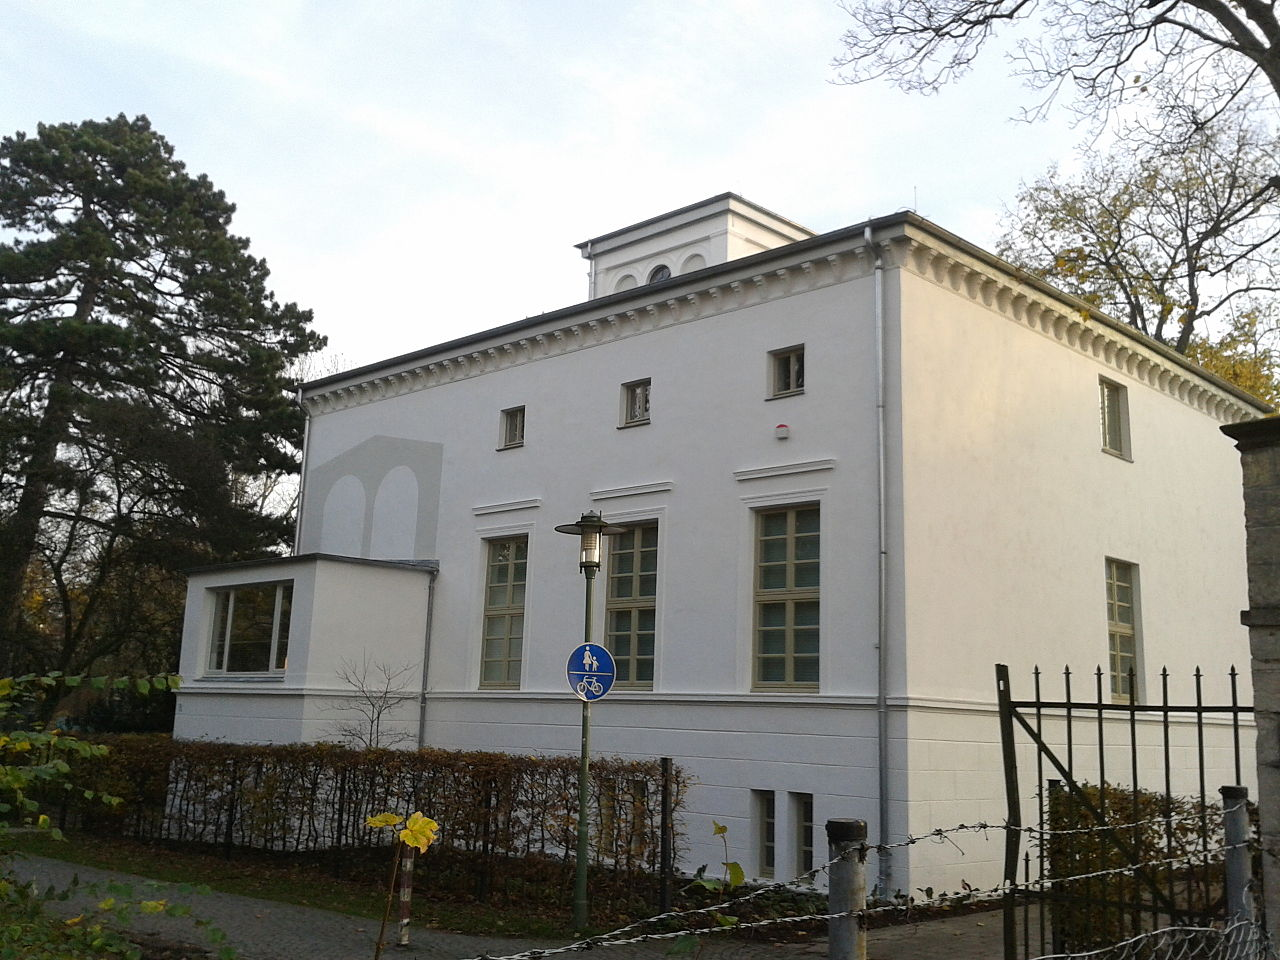 Bild Museum Huelsmann Bielefeld